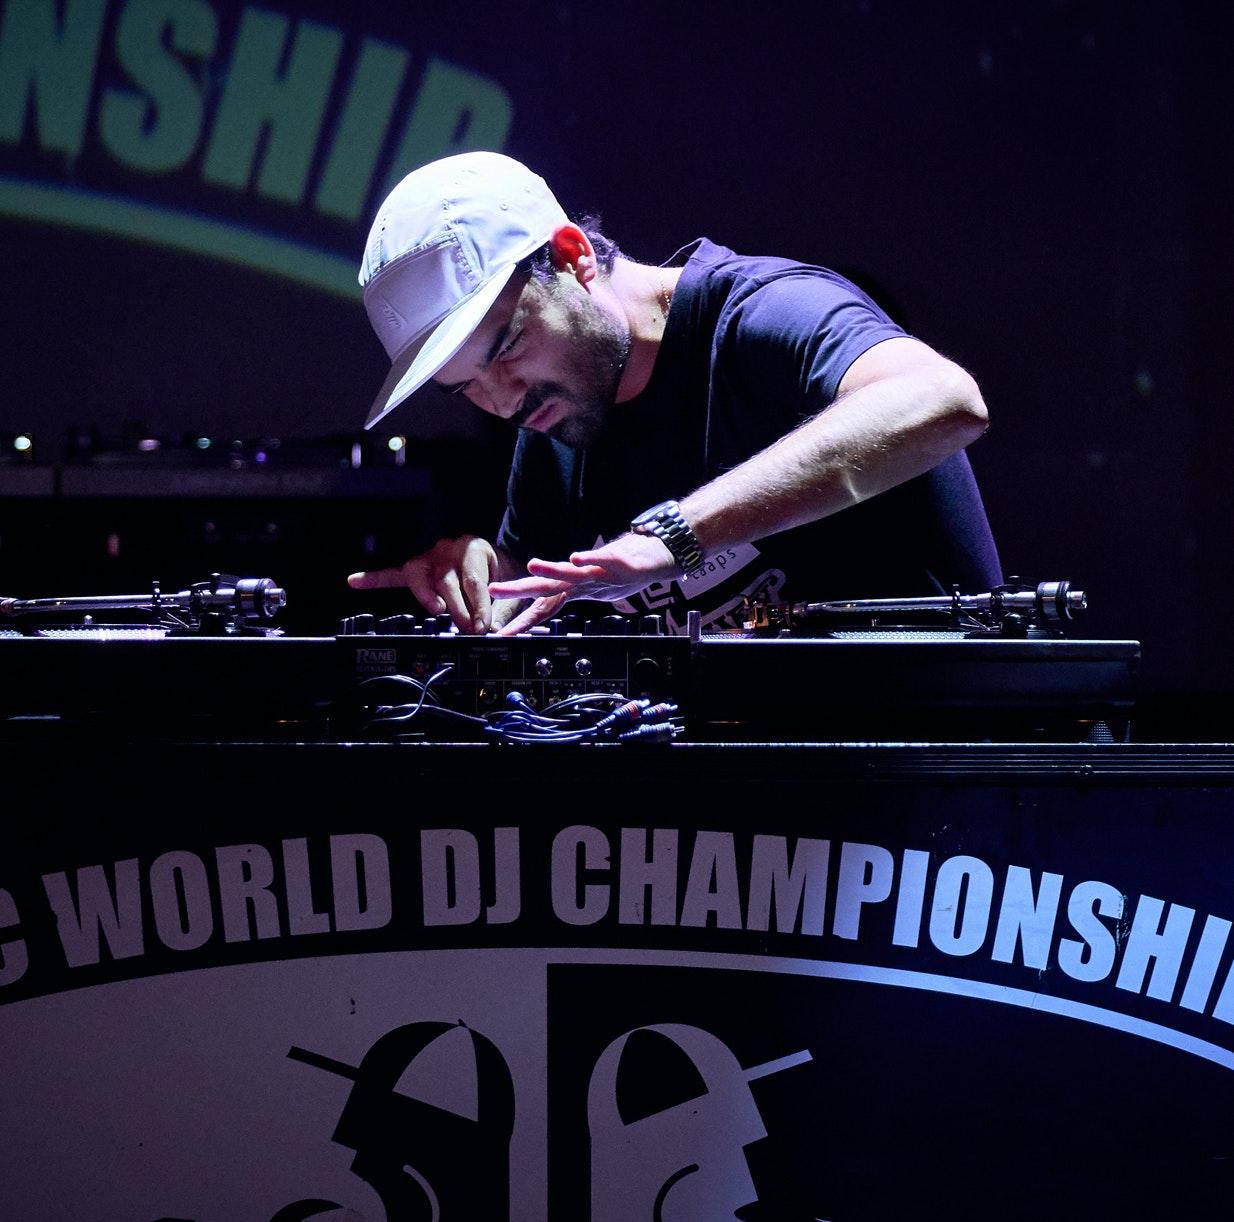 THE 2019 DMC WORLD DJ CHAMPIONSHIPS Tickets | £16 50 | 28th Sep @ Islington  Assembly Hall, London | DICE